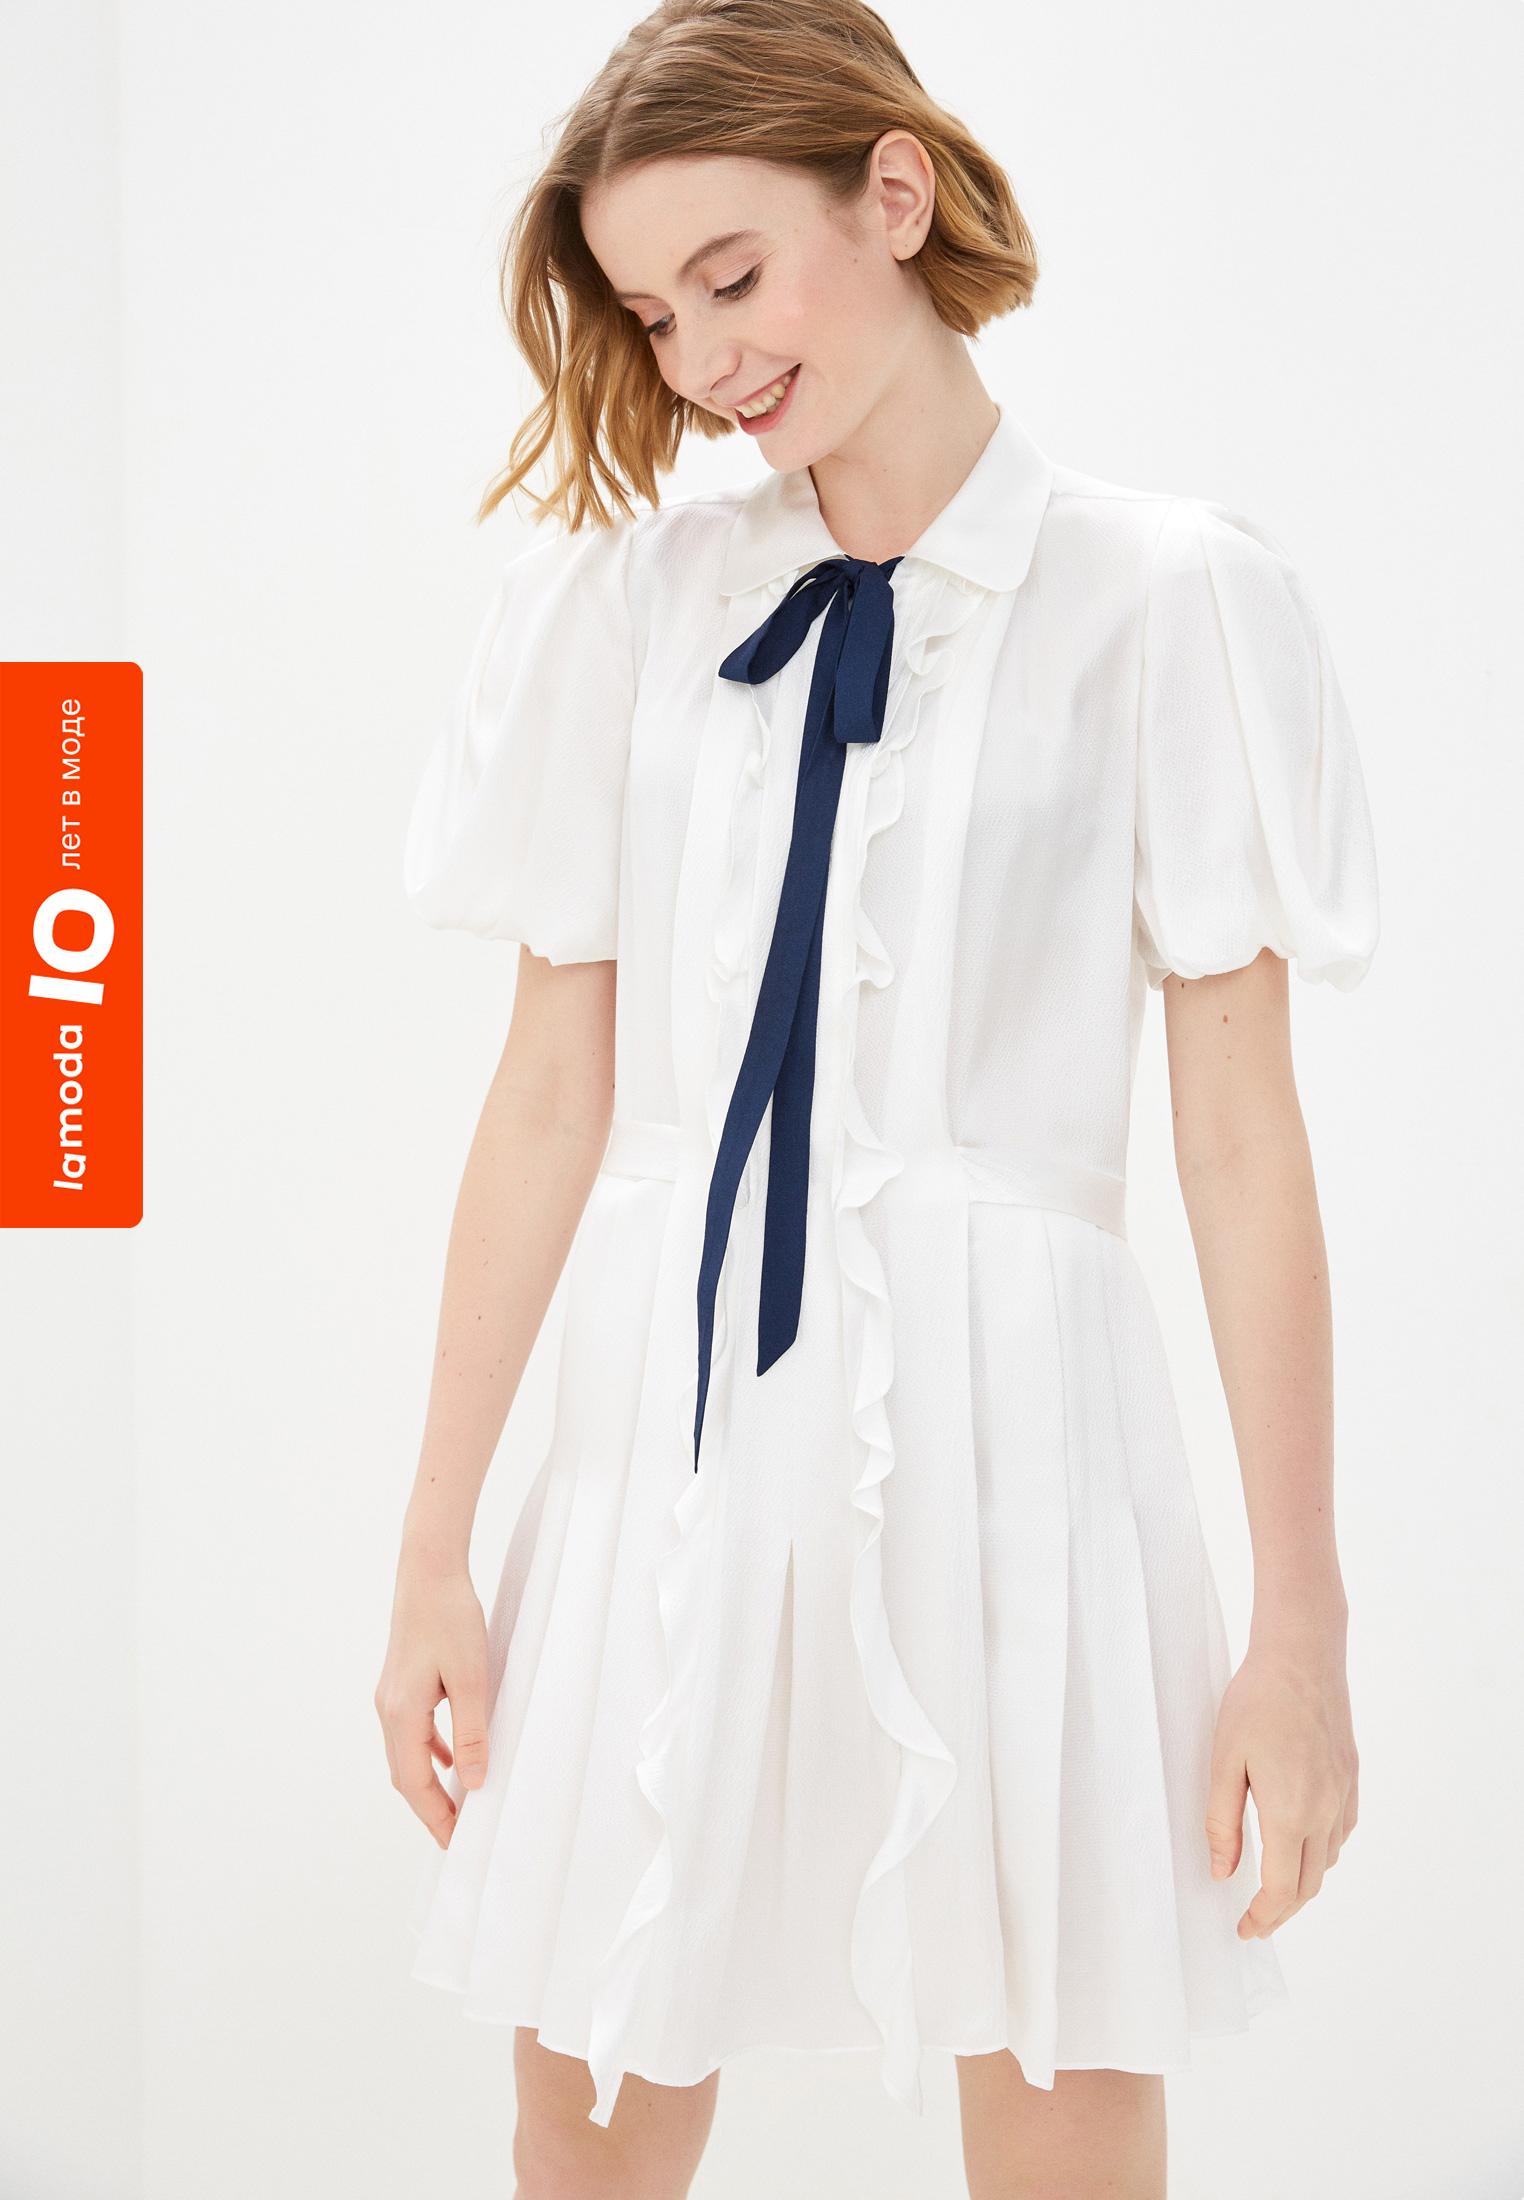 Платье Tommy Hilfiger (Томми Хилфигер) Платье Tommy Hilfiger